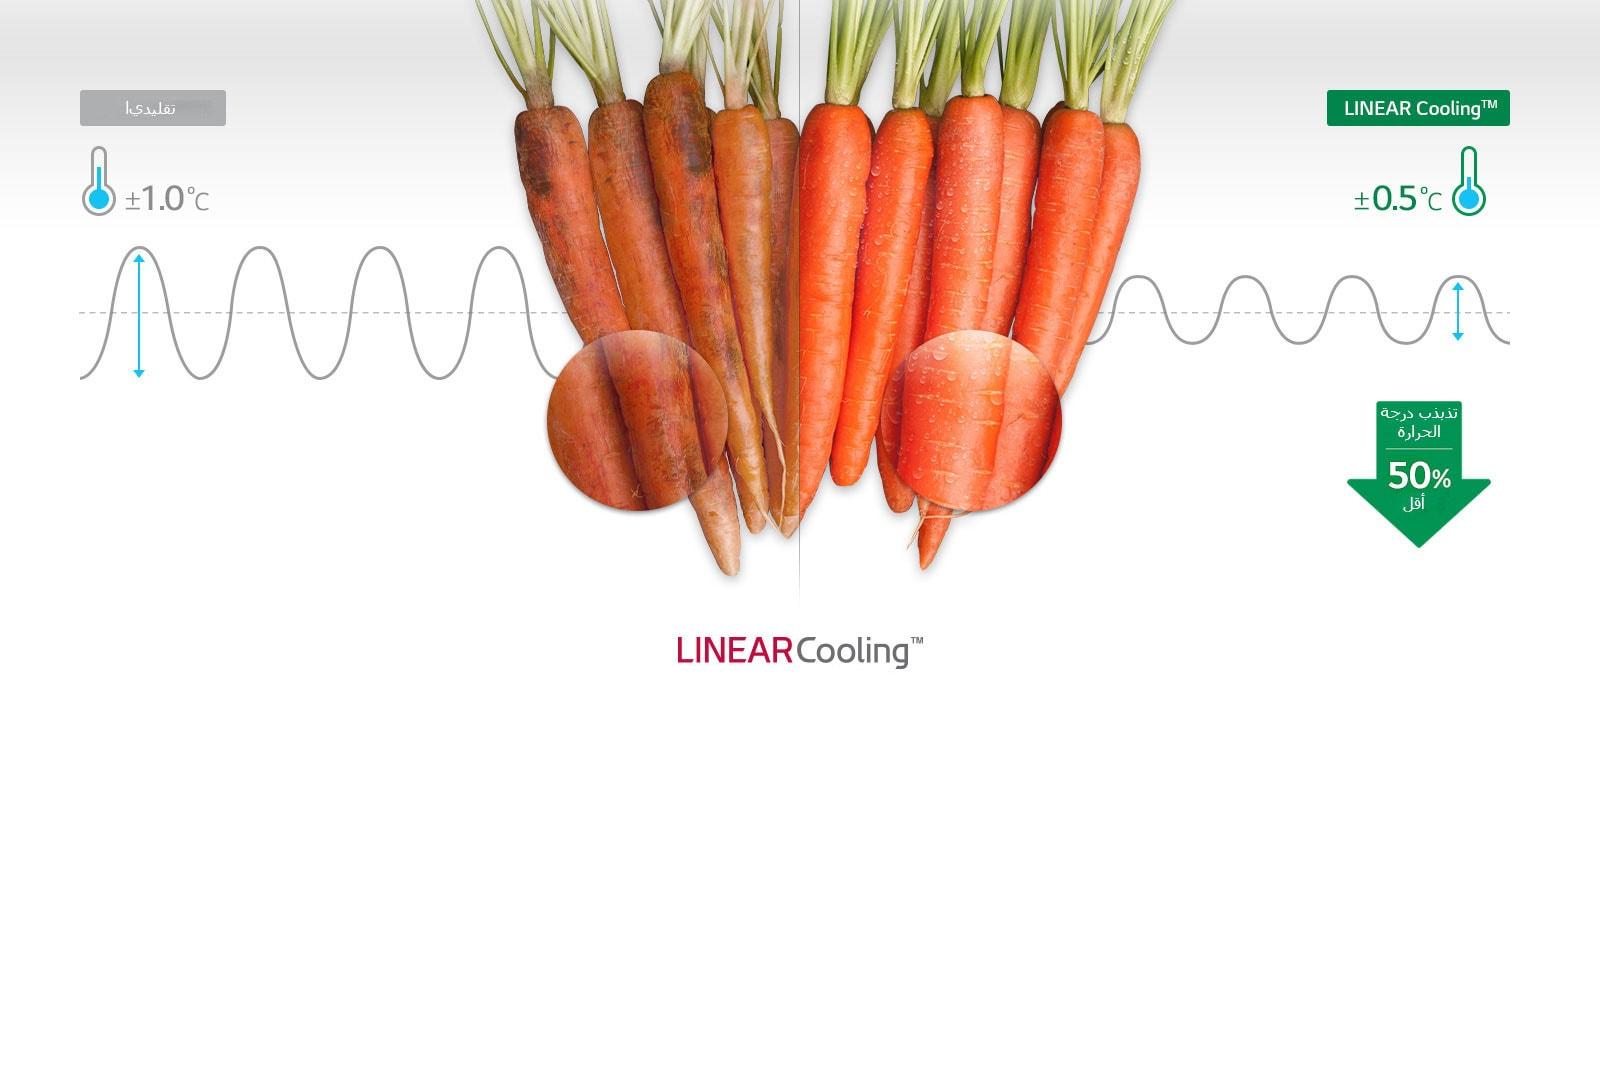 LT19HBHSLN_Linear_Cooling_271118_D